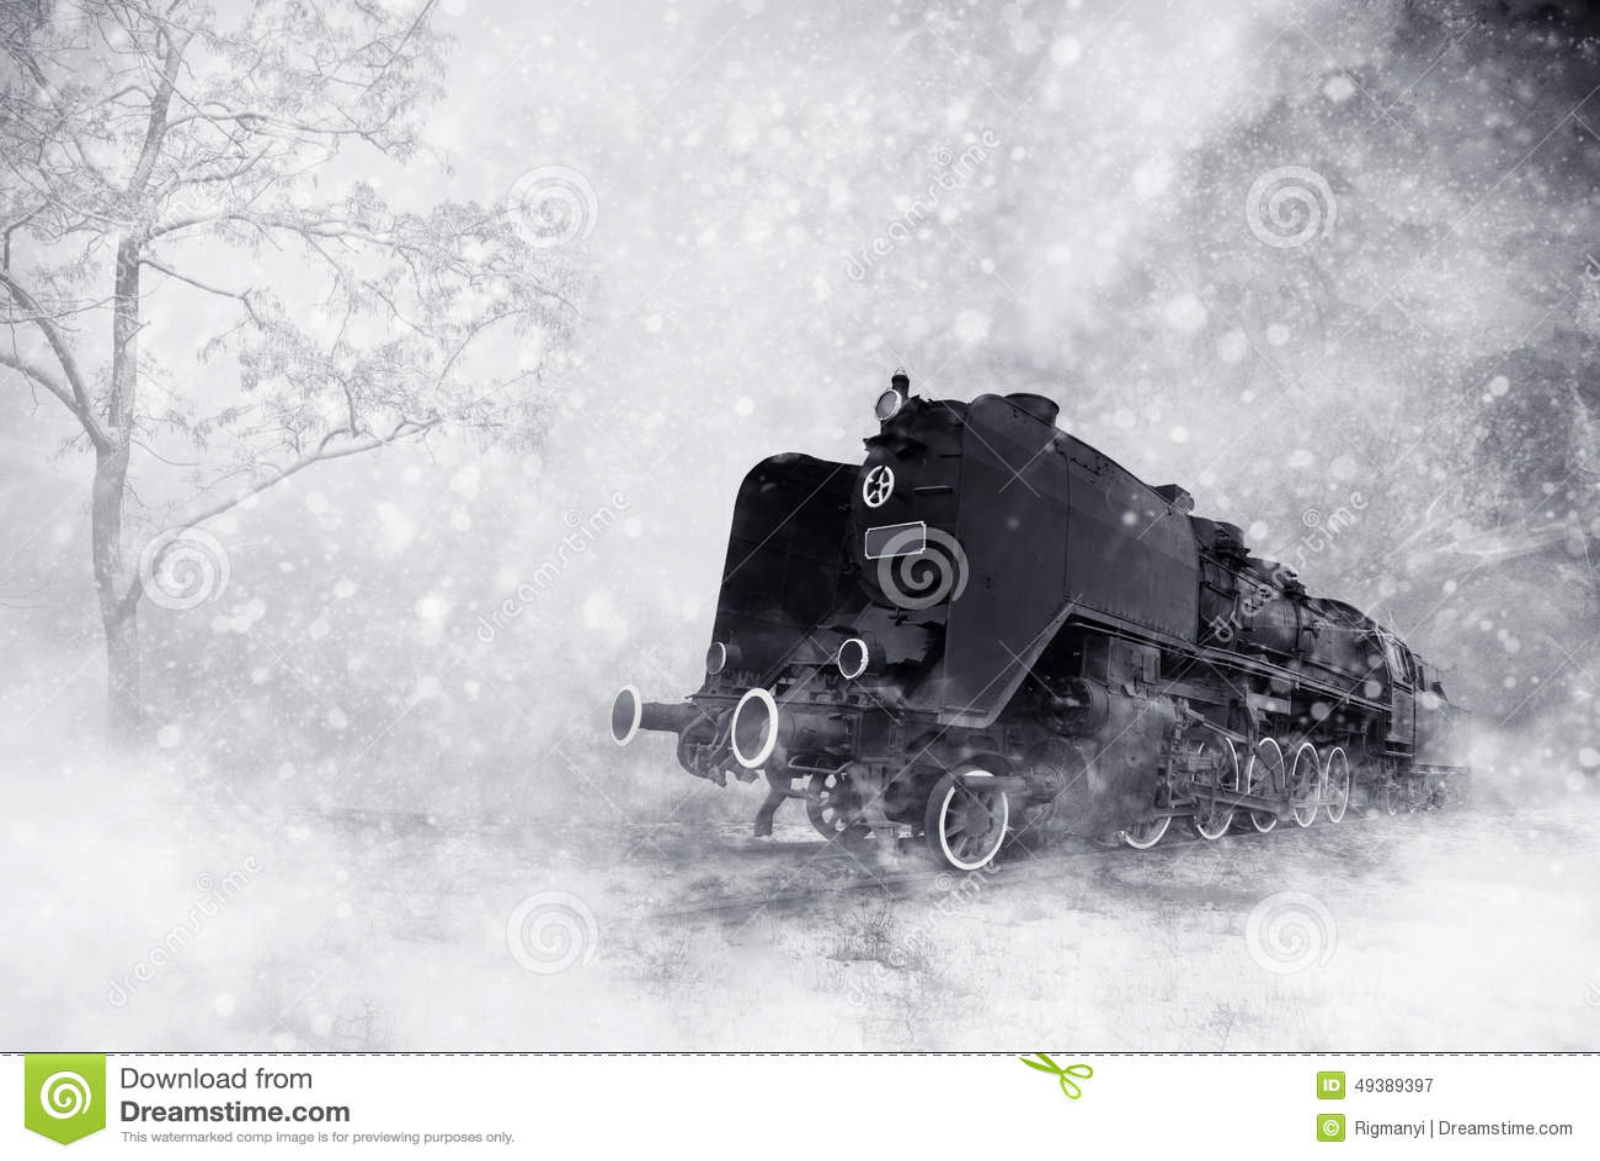 Download Winter storm stock illustration. Illustration of locomotive - 49389397